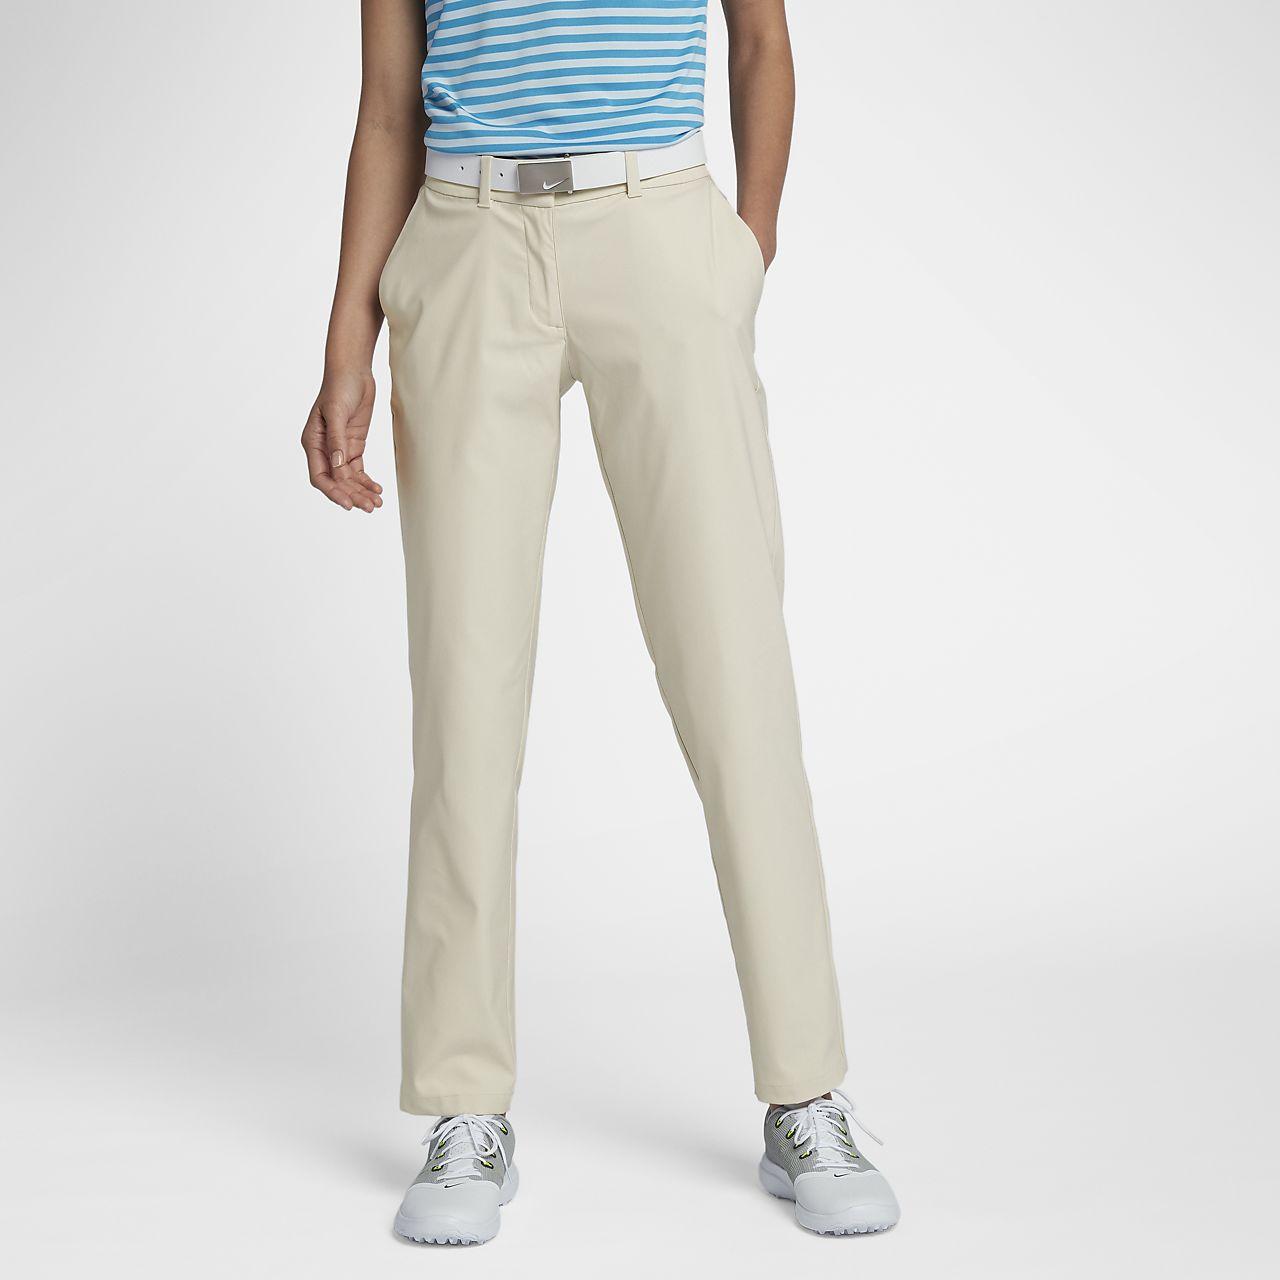 Nike Flex Women's Golf Pants